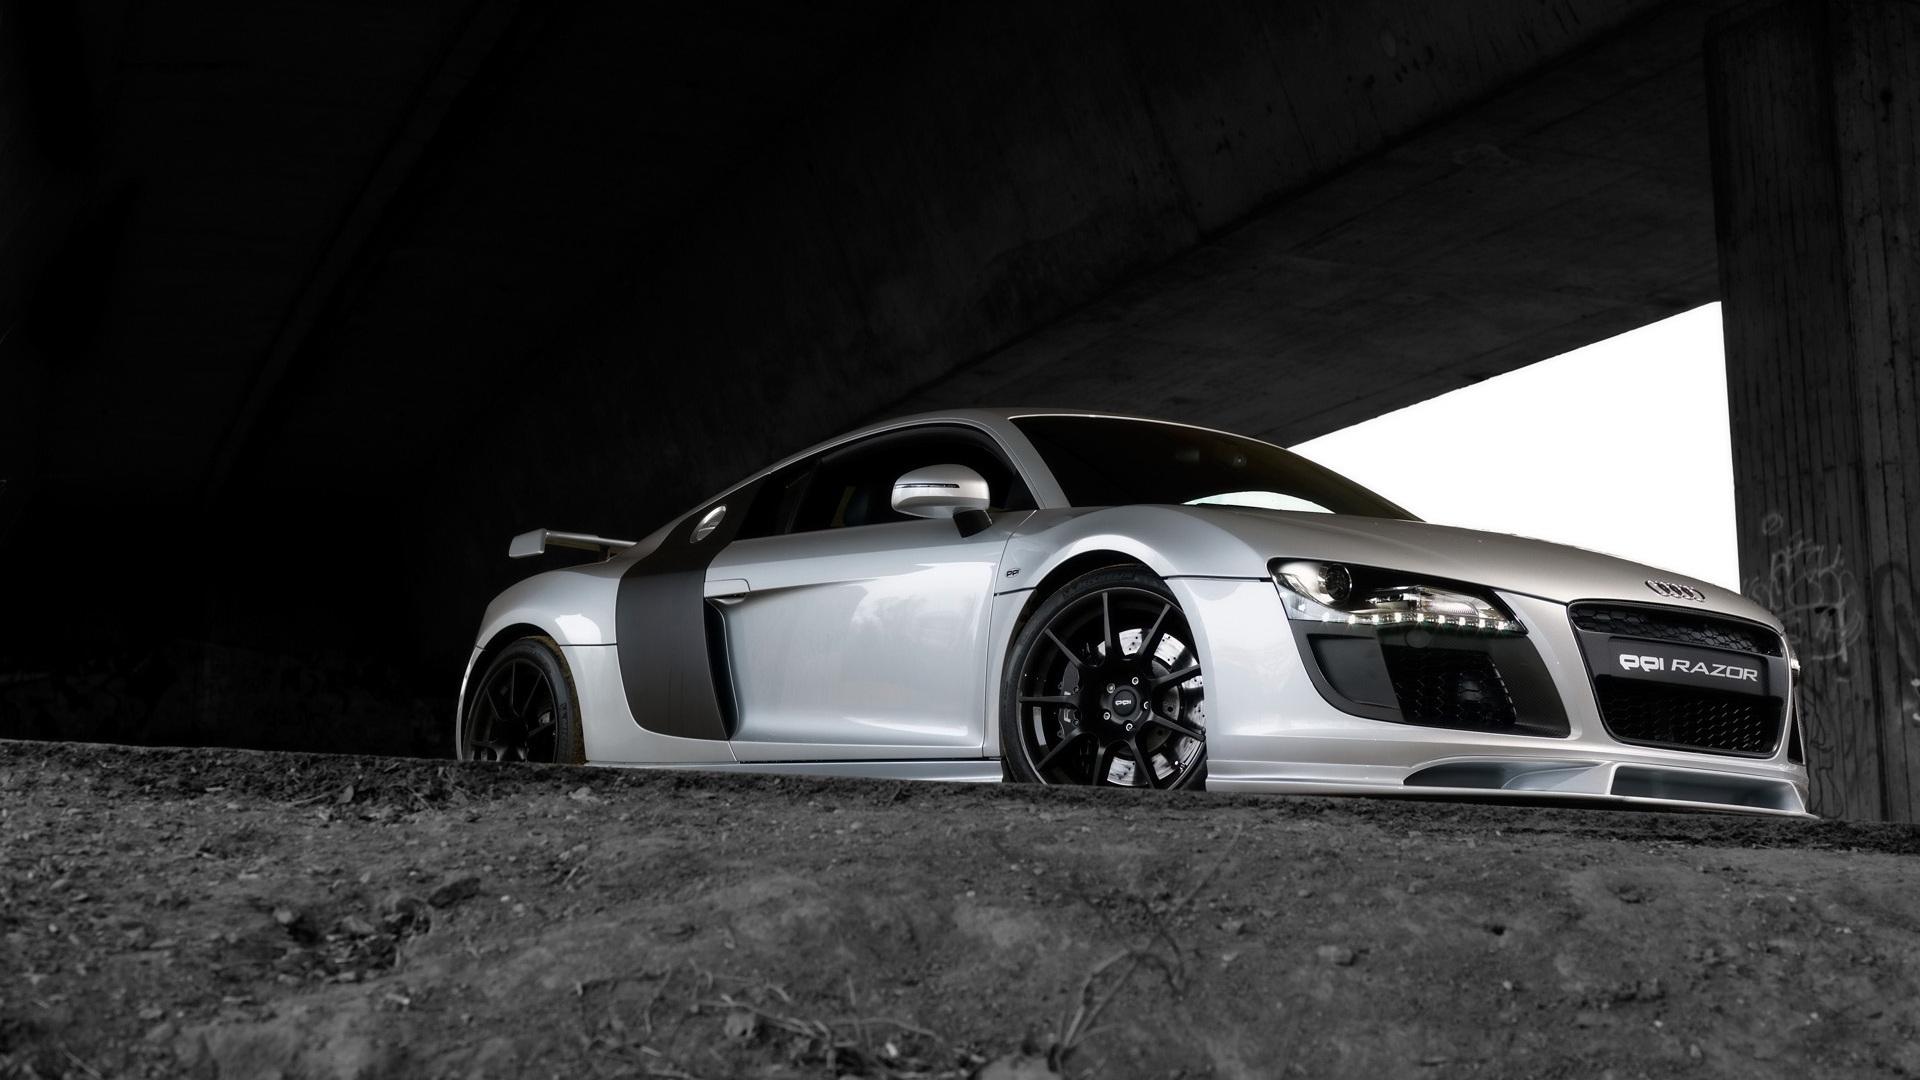 Audi Full HD Wallpaper and Background 1920x1080 ID243812